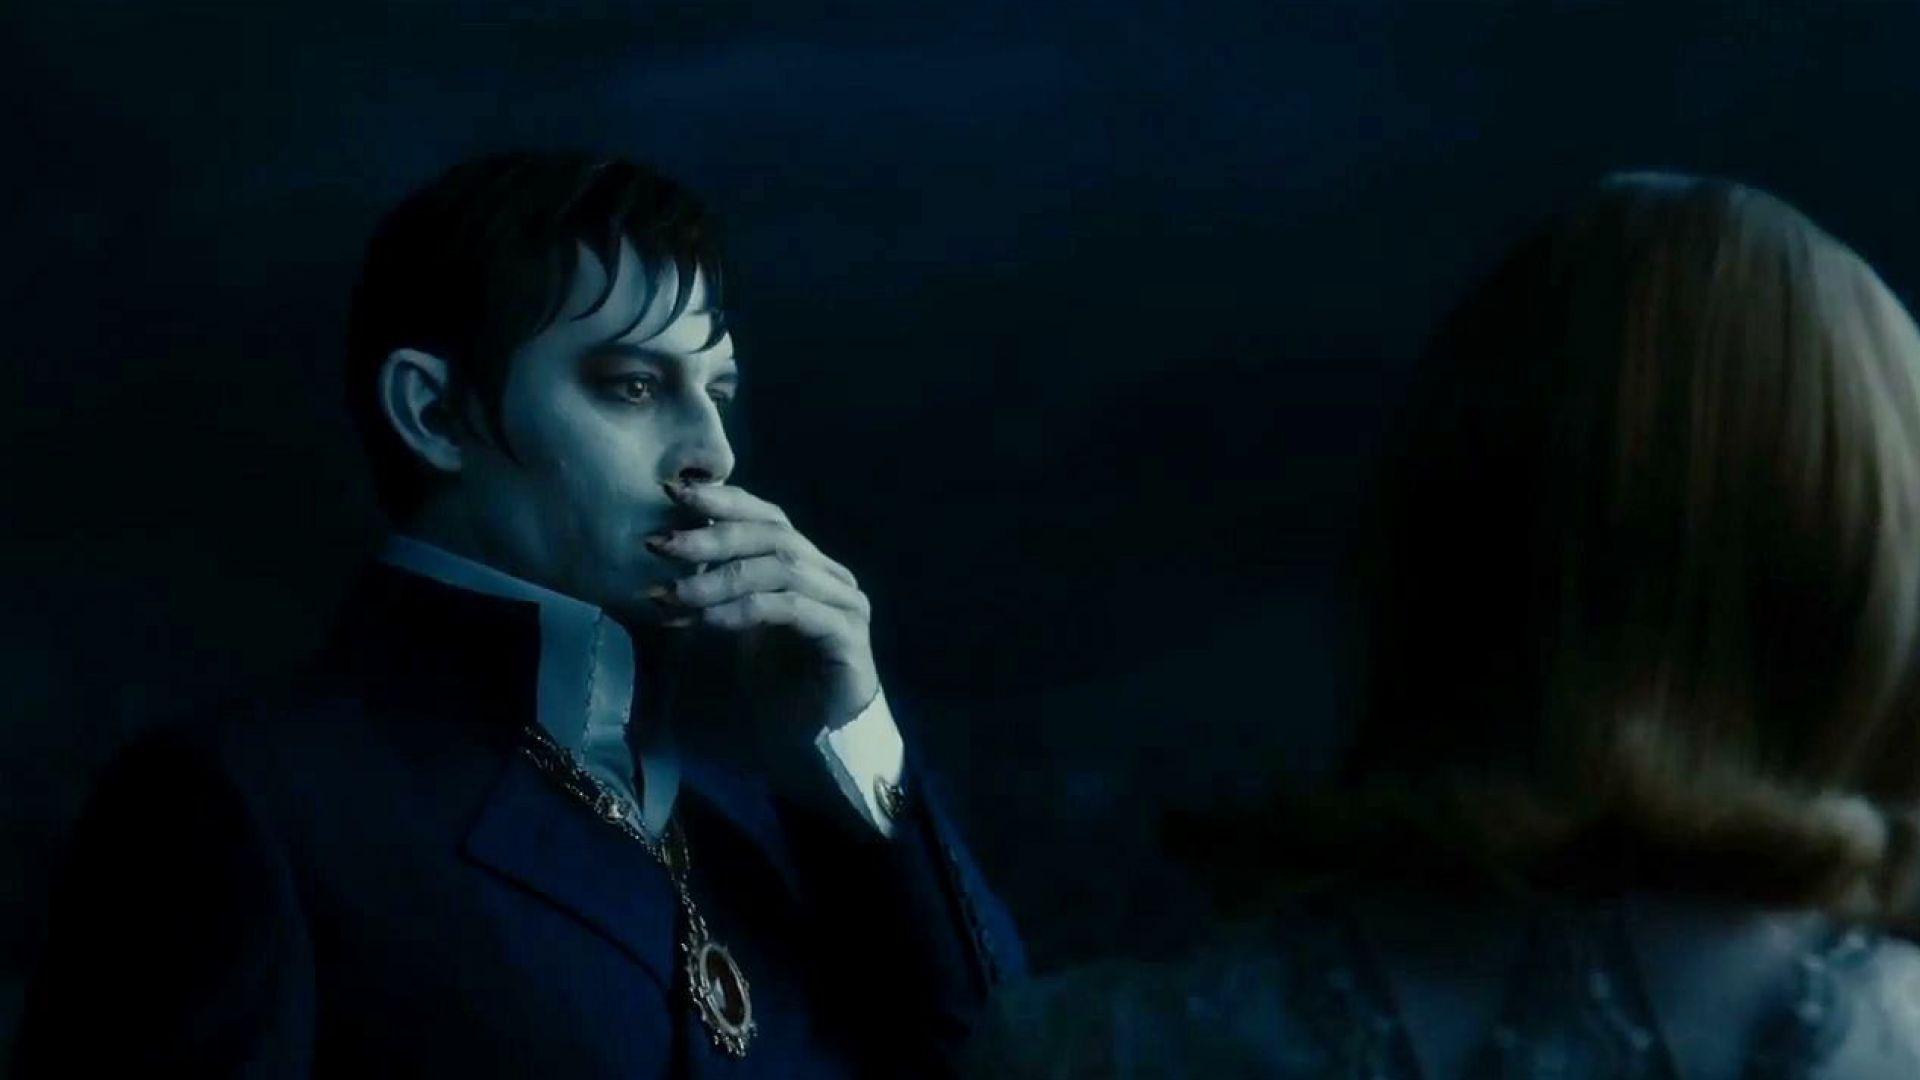 Johnny Depp and Bella Heathcote almost kiss in Dark Shadows